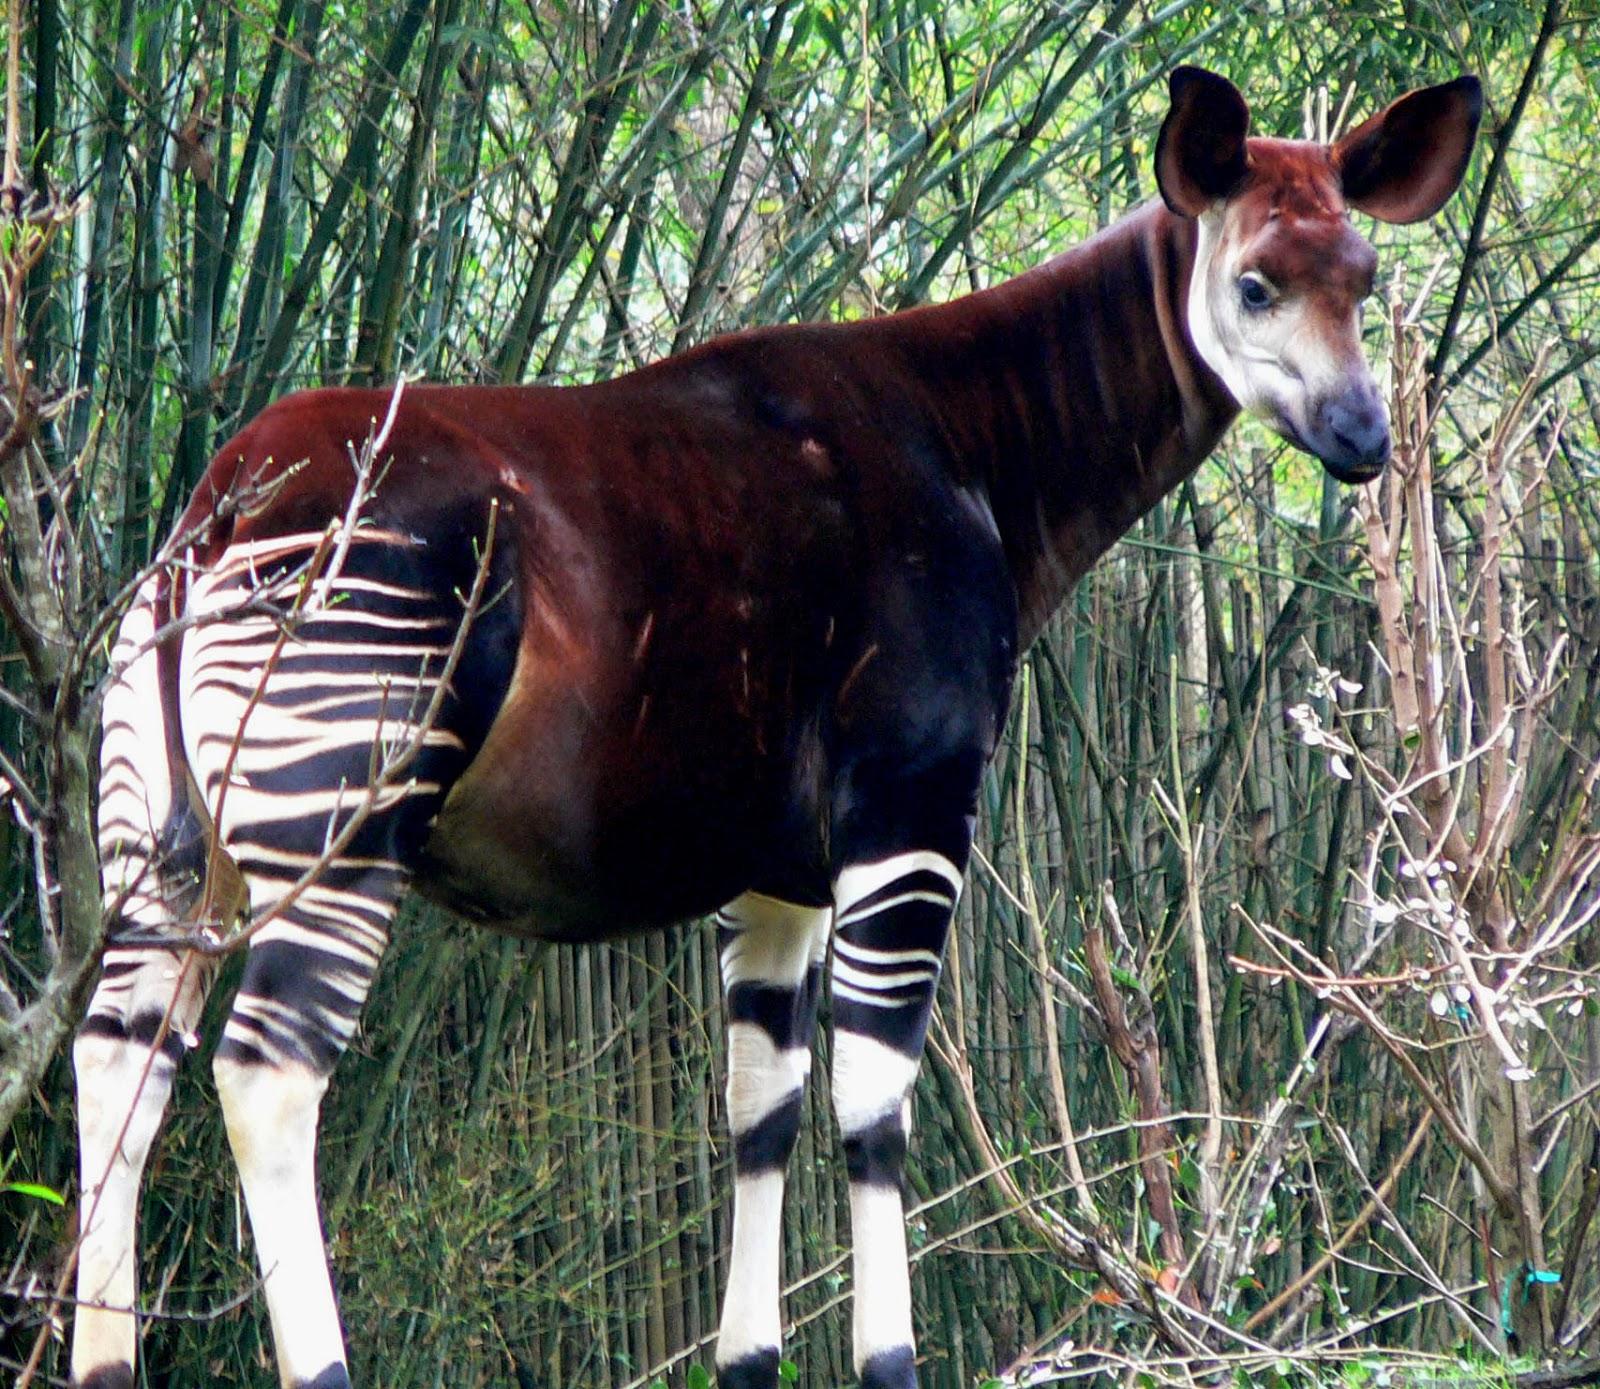 Ocapis (Okapia johnstoni)